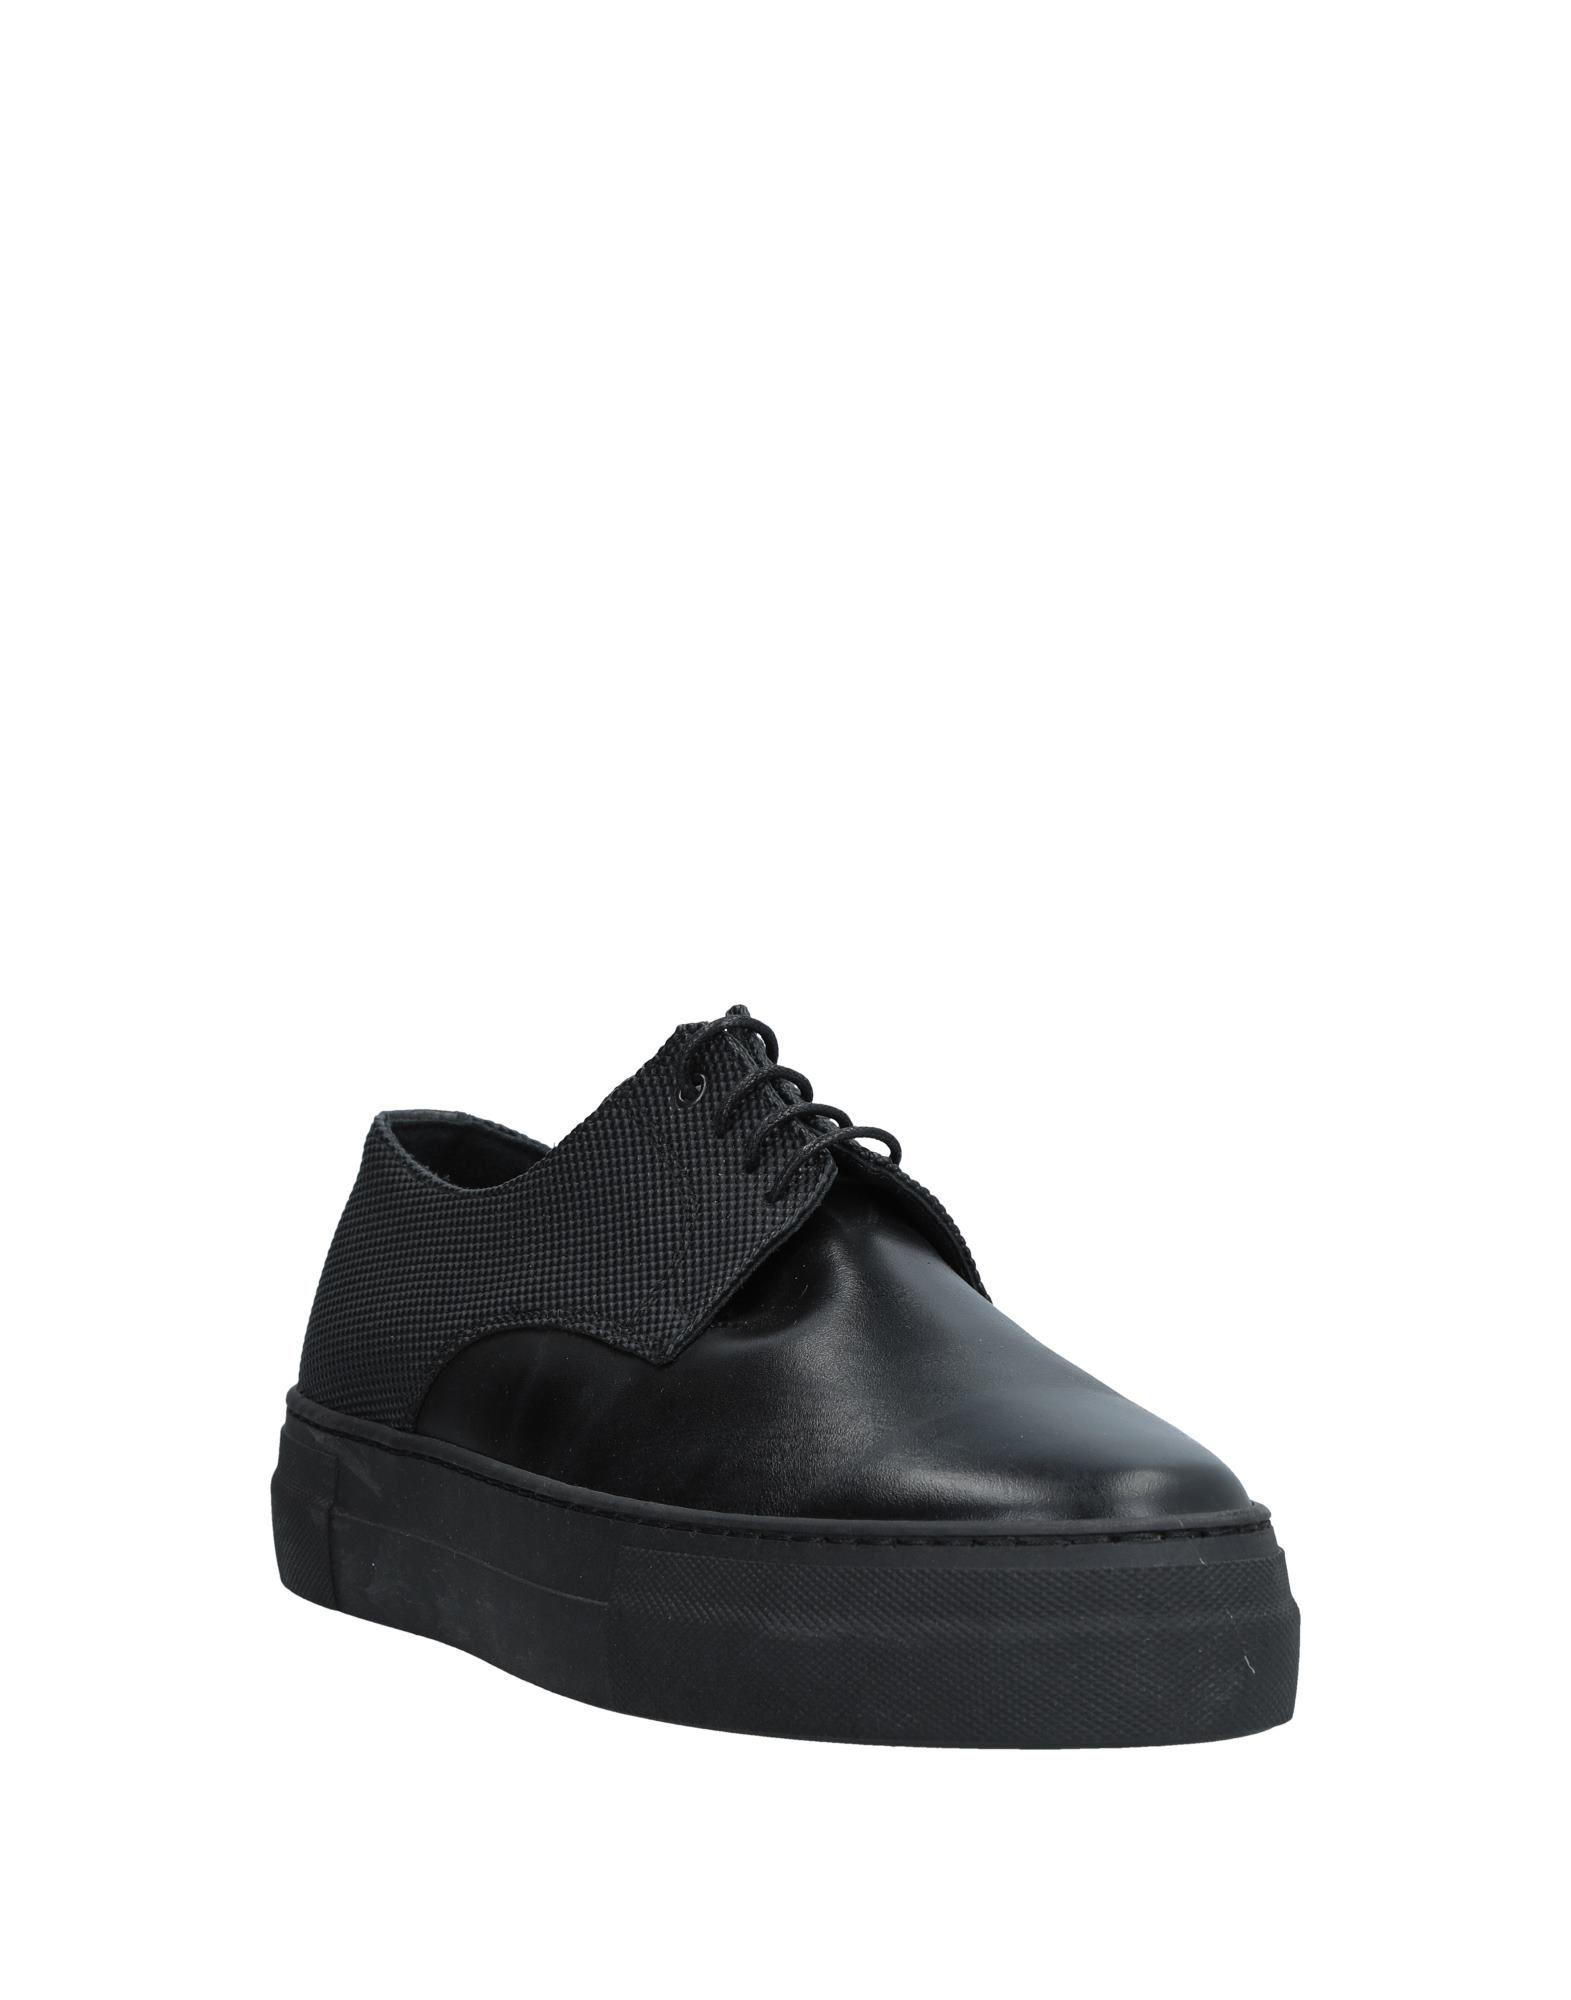 Bottega Marchigiana Sneakers Herren  11541878KH Gute Qualität beliebte Schuhe